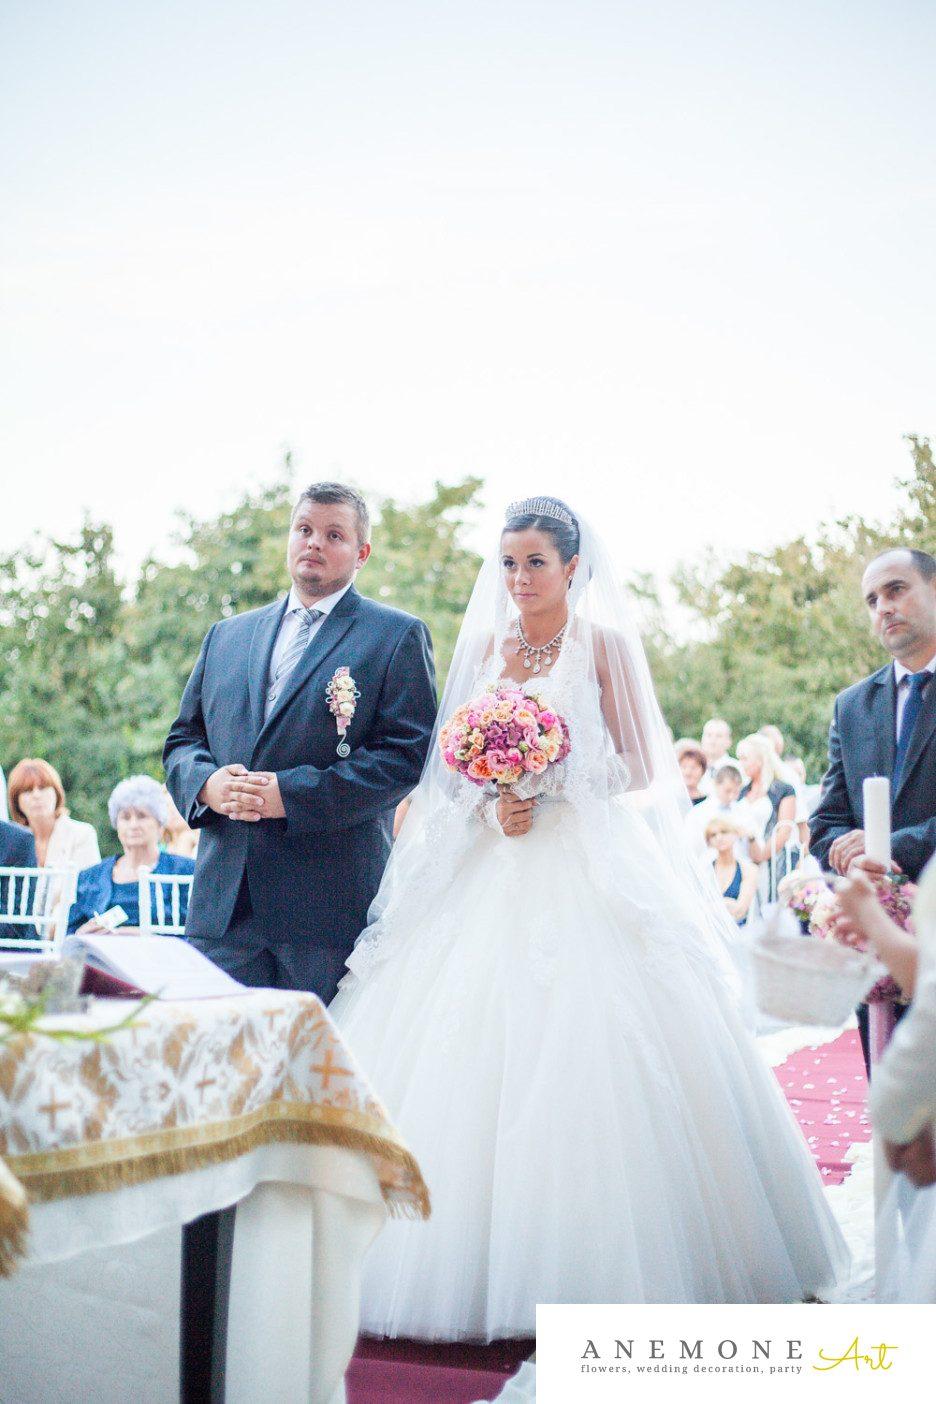 Poza, foto cu Flori de nunta buchet mireasa, roz, trandafiri in Arad, Timisoara, Oradea (wedding flowers, bouquets) nunta Arad, Timisoara, Oradea